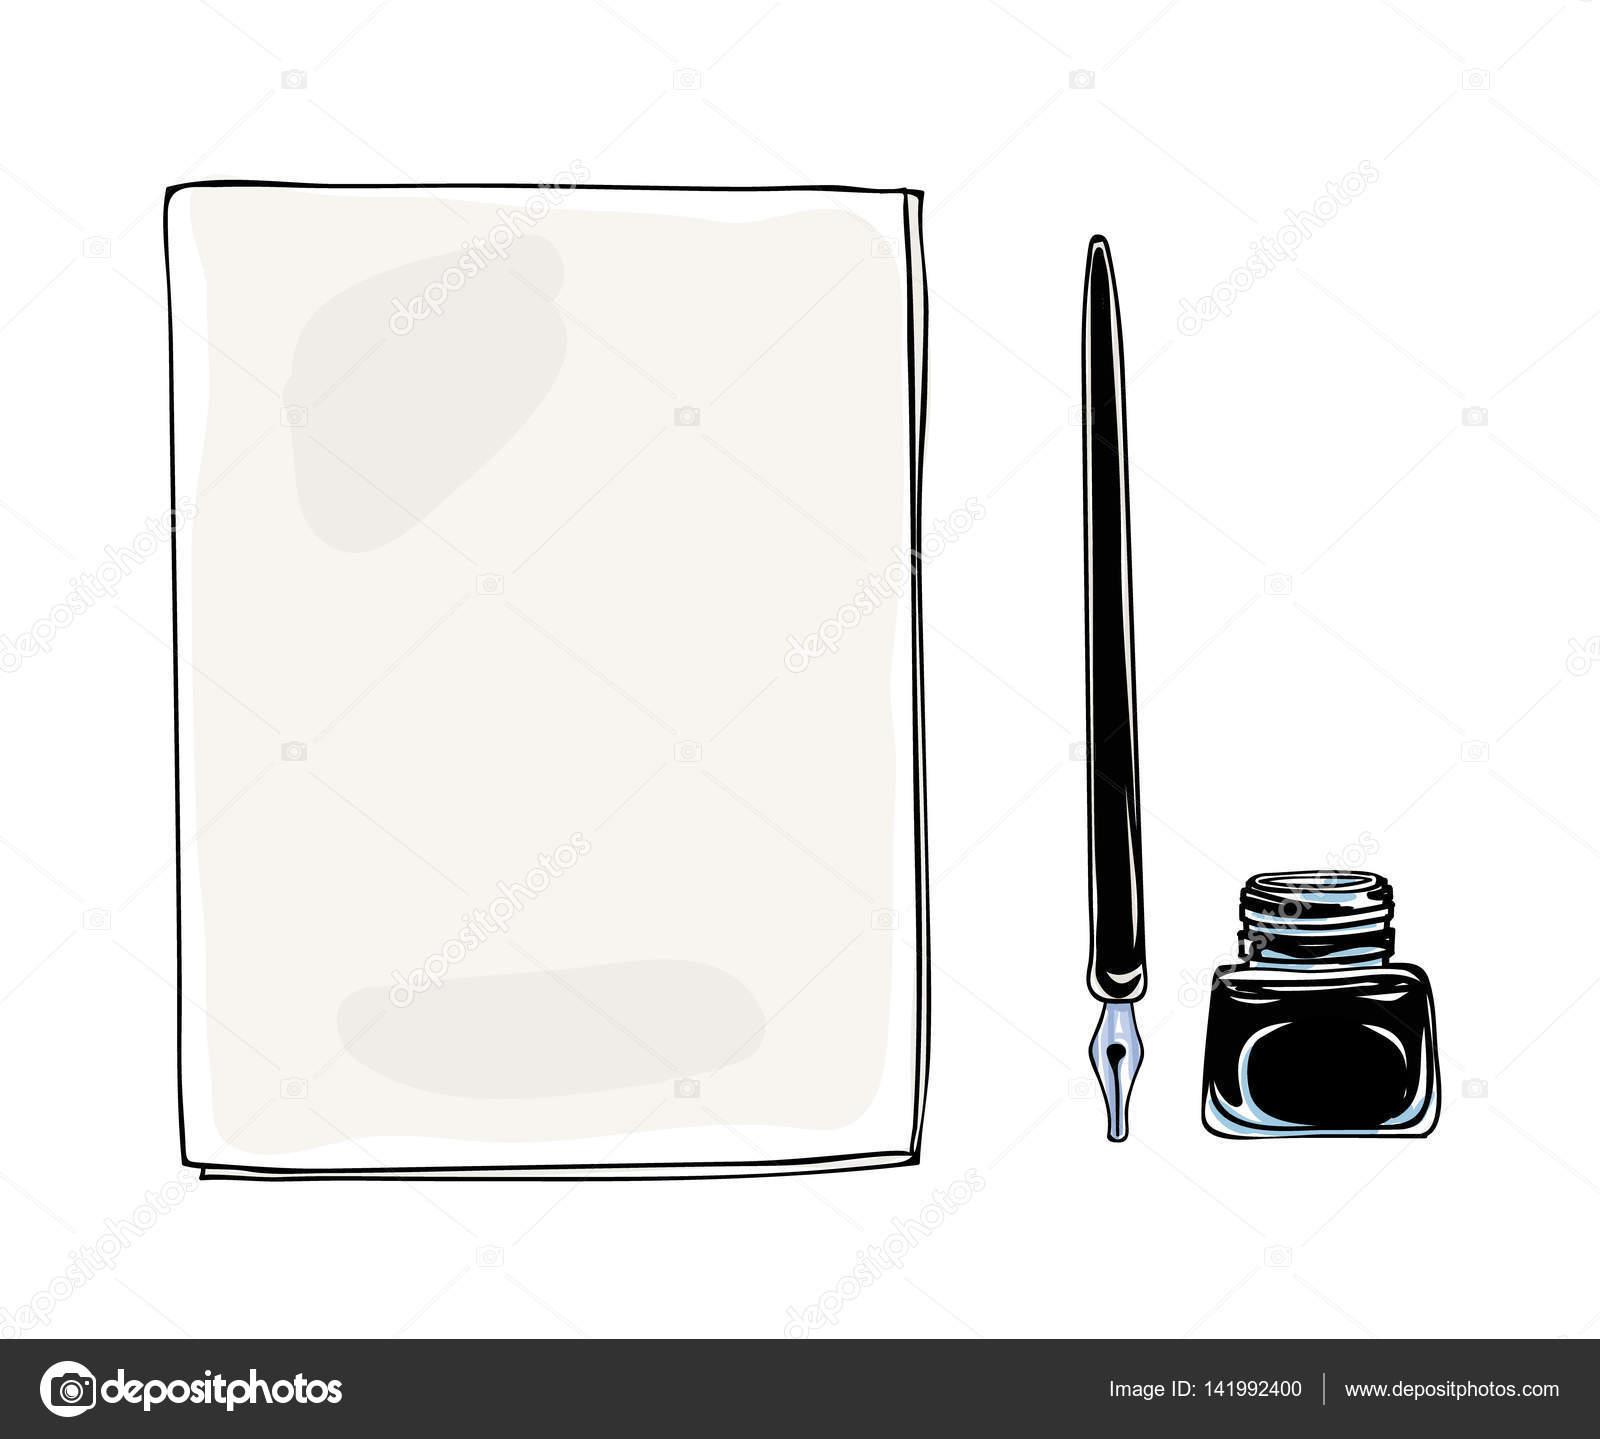 Drawn pen vintage Pen drawn vintage hand and